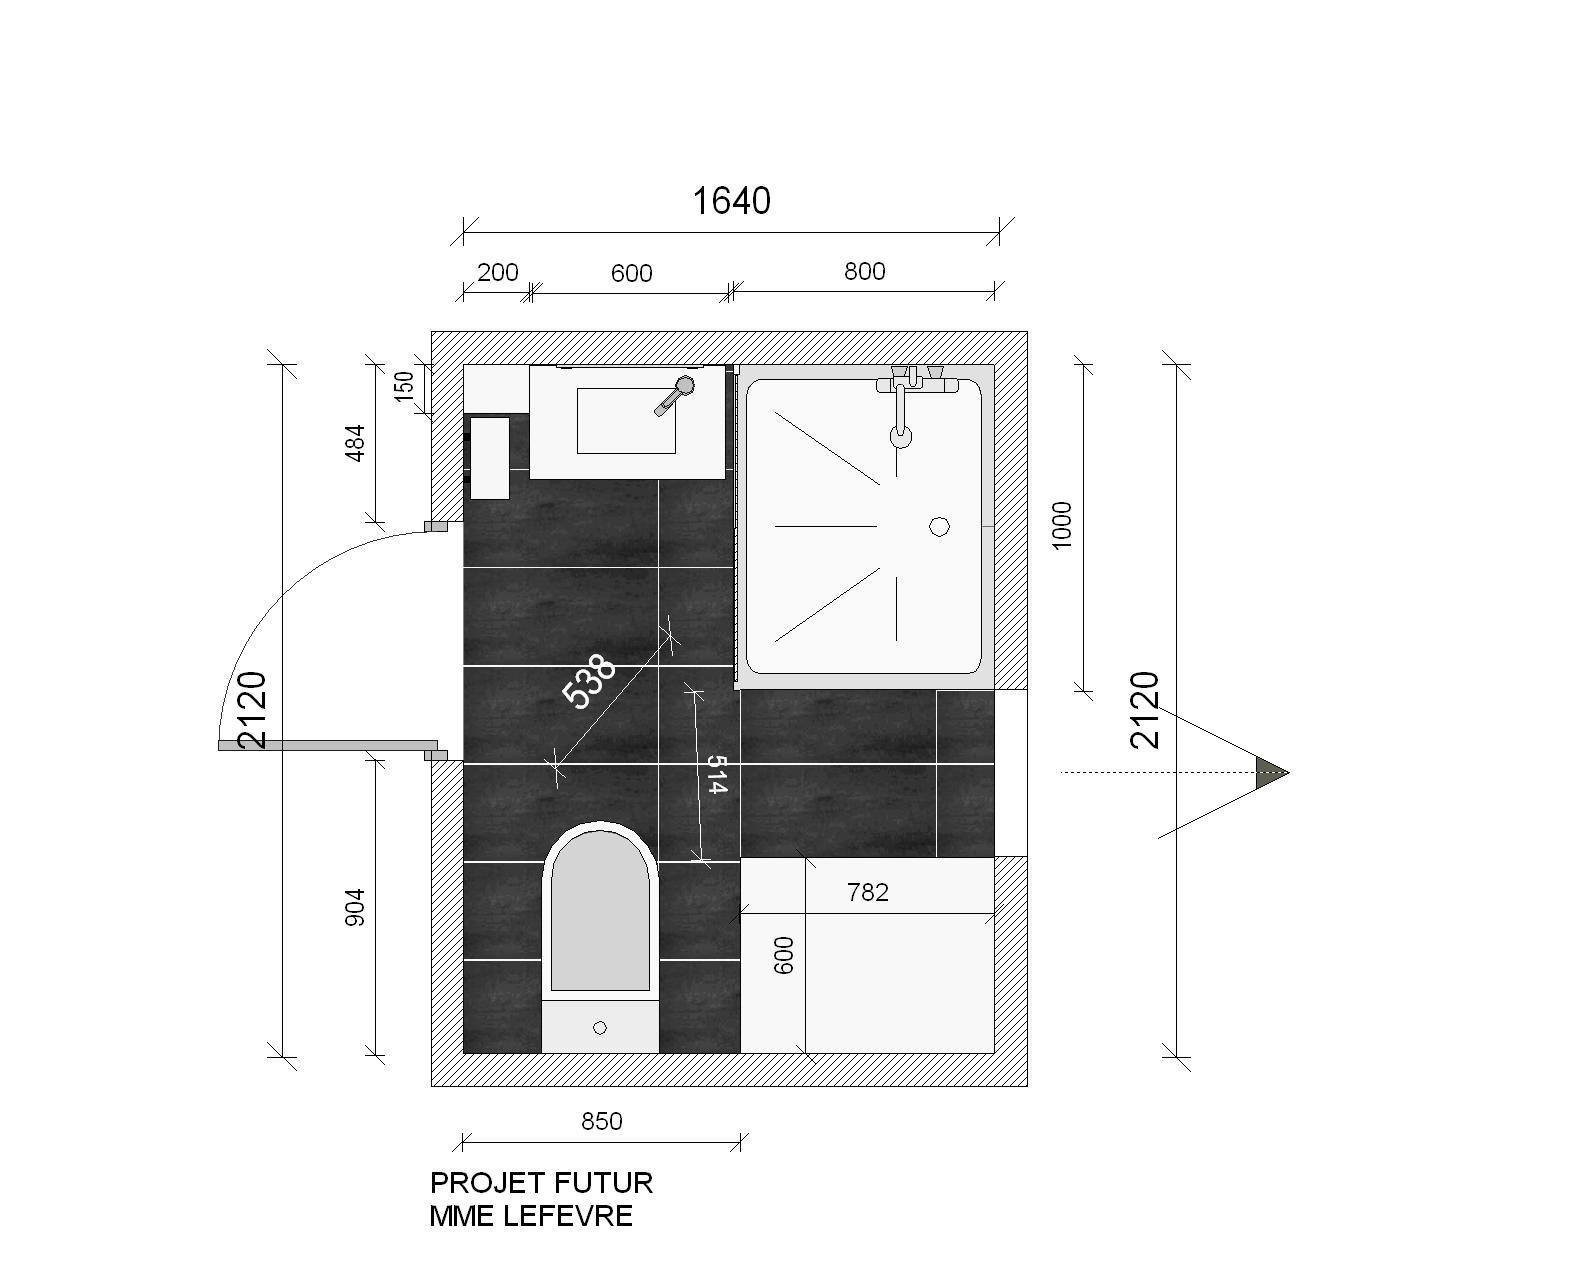 bain douche younes. Black Bedroom Furniture Sets. Home Design Ideas